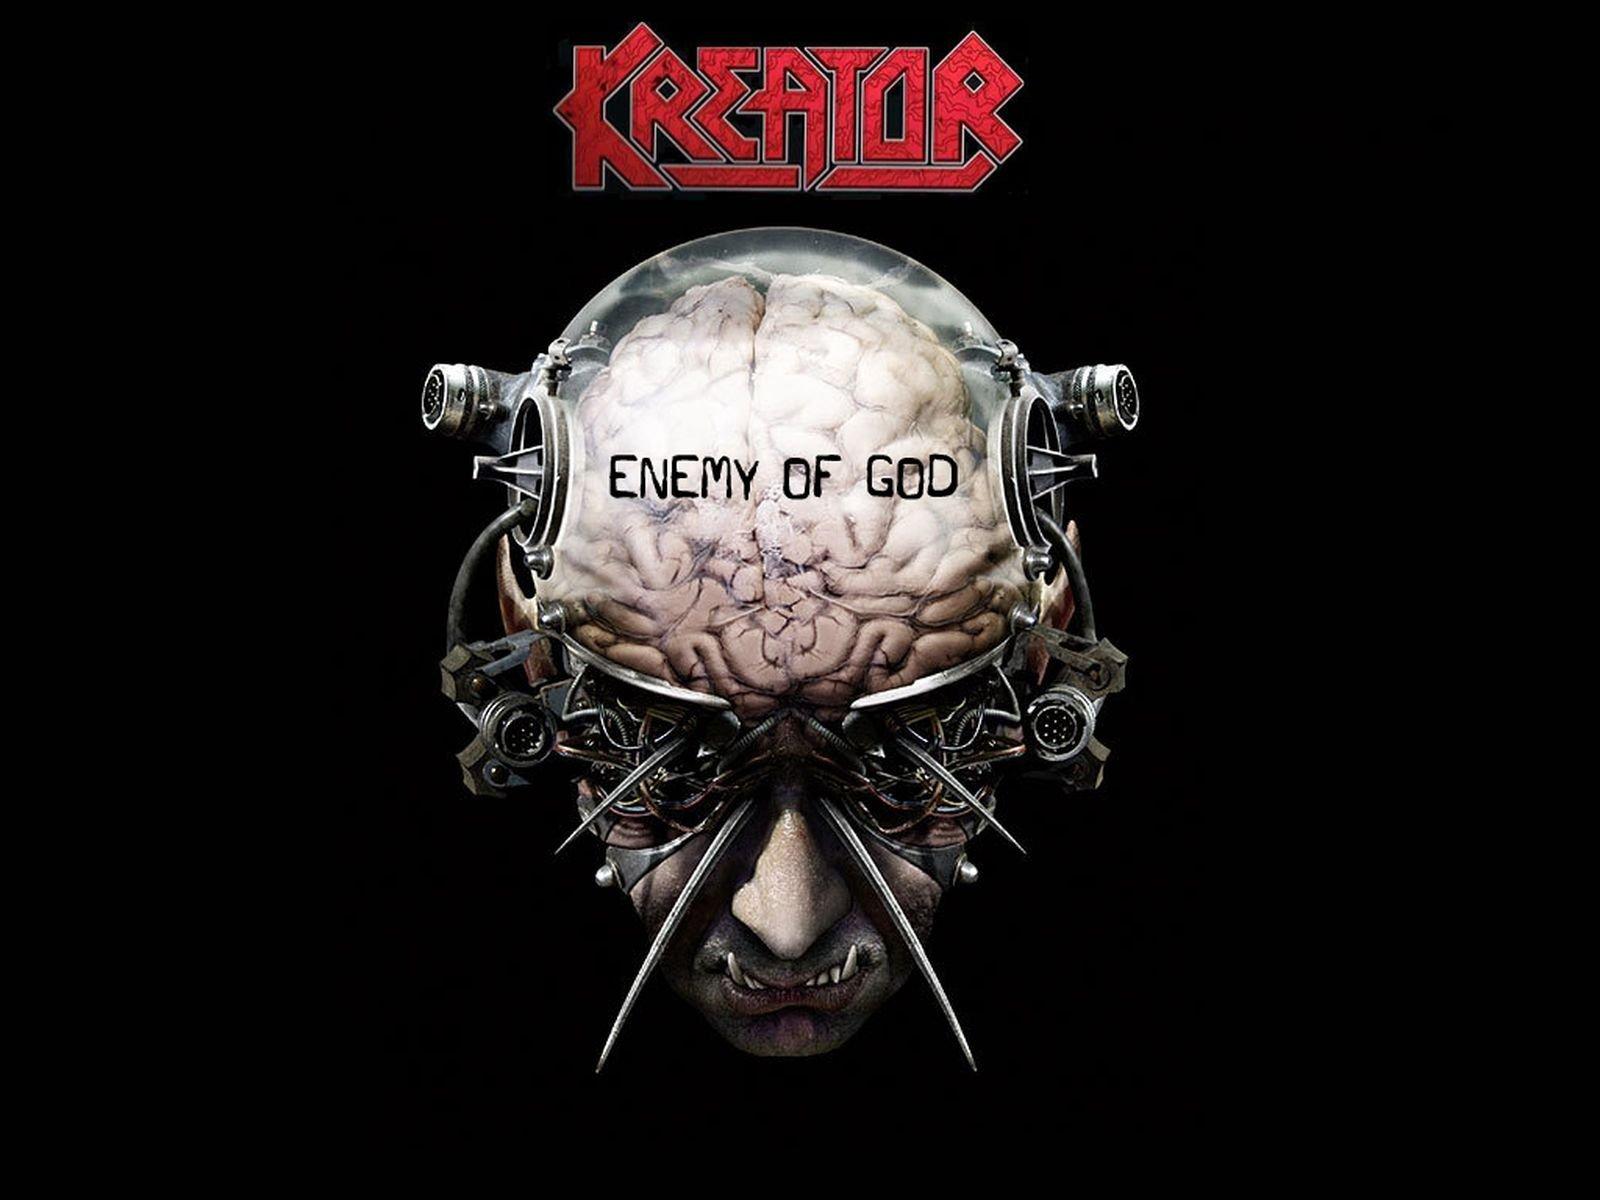 Kreator Wallpaper Kreator Enemy Of God Album 1695697